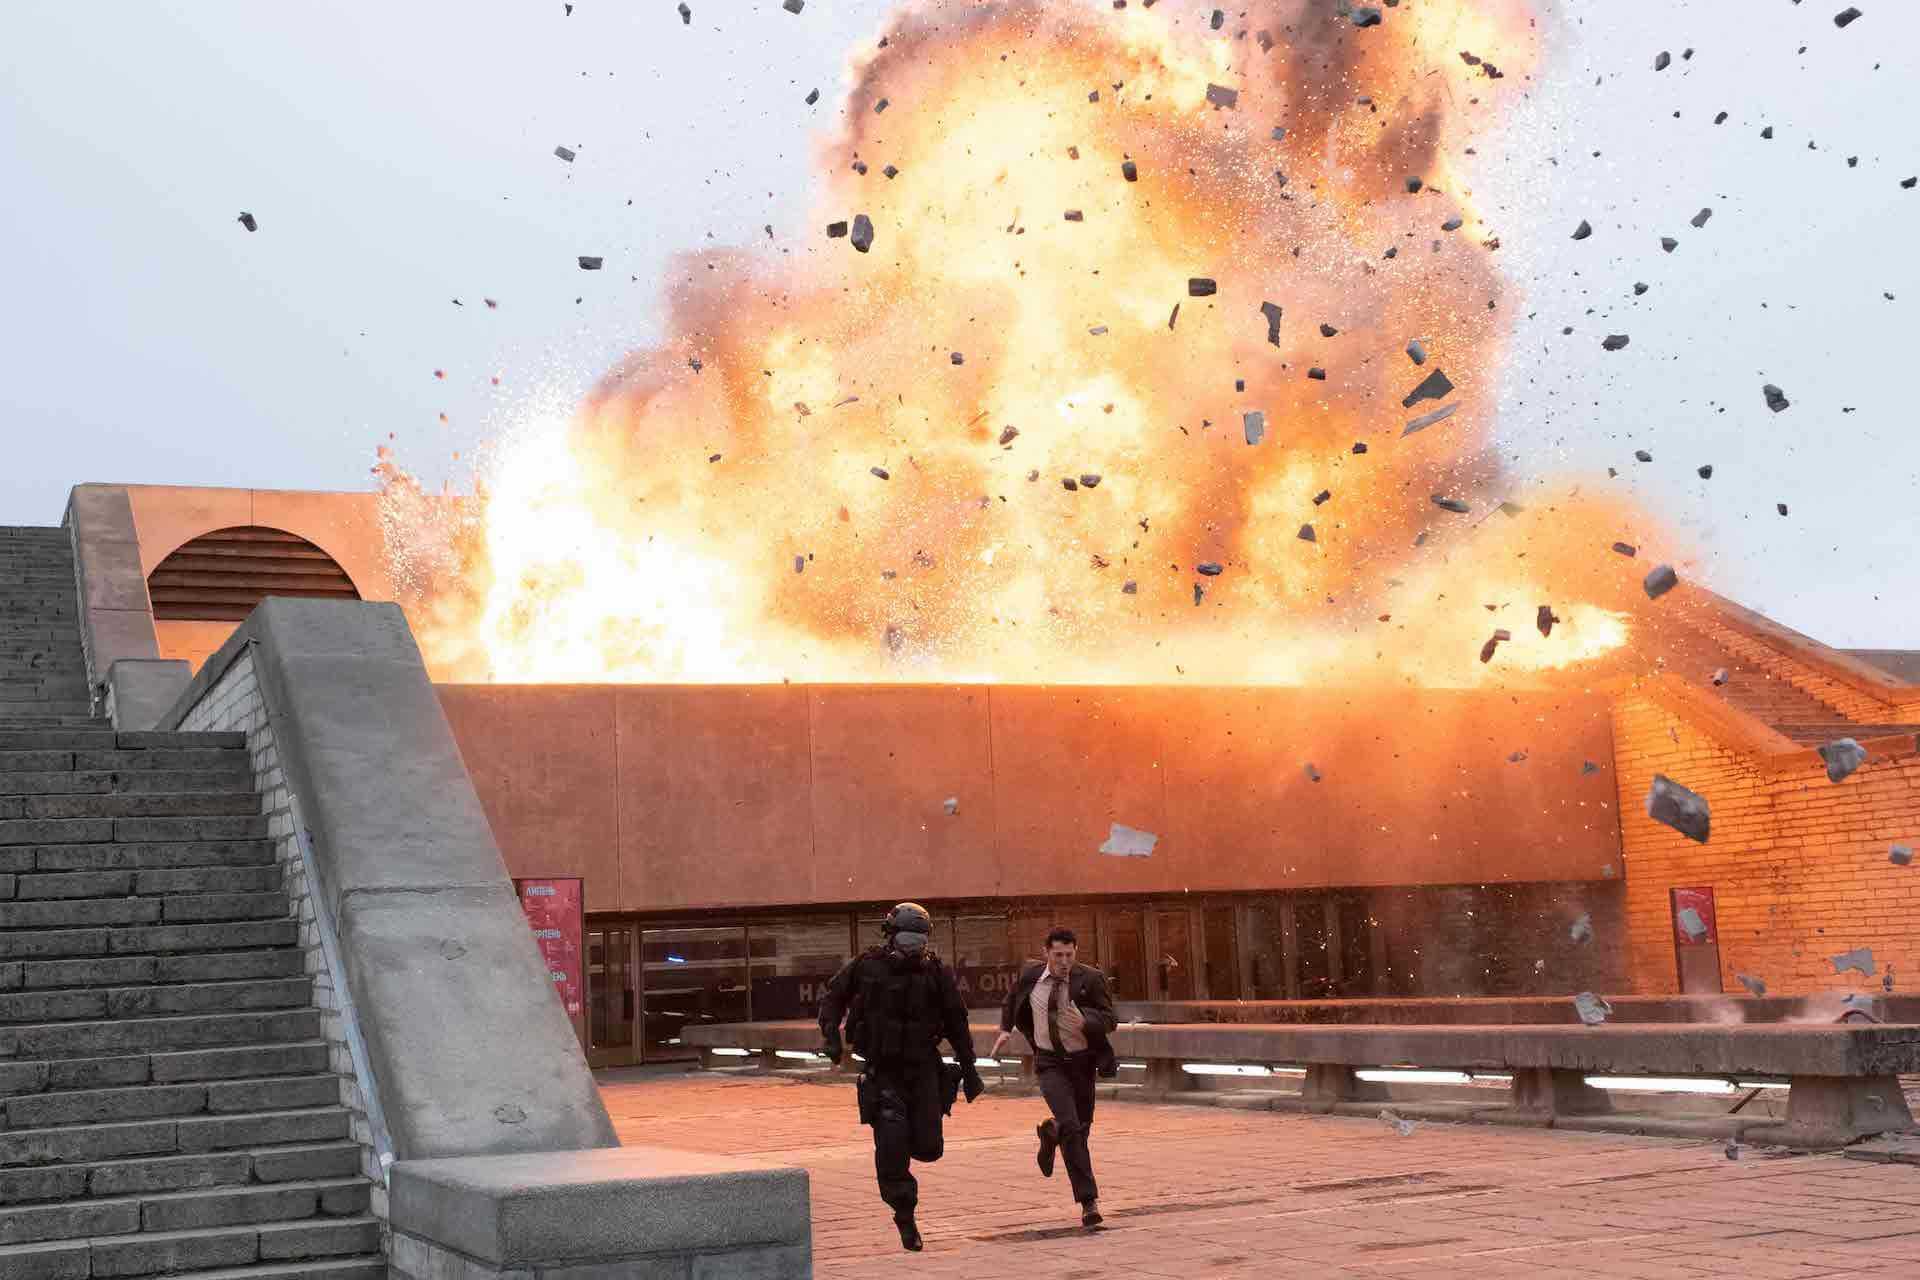 『TENET テネット』監督クリストファー・ノーランから直筆の感謝状がグランドシネマサンシャインに!IMAX®シアター世界第1位の成績を達成 film201016_tenet_4